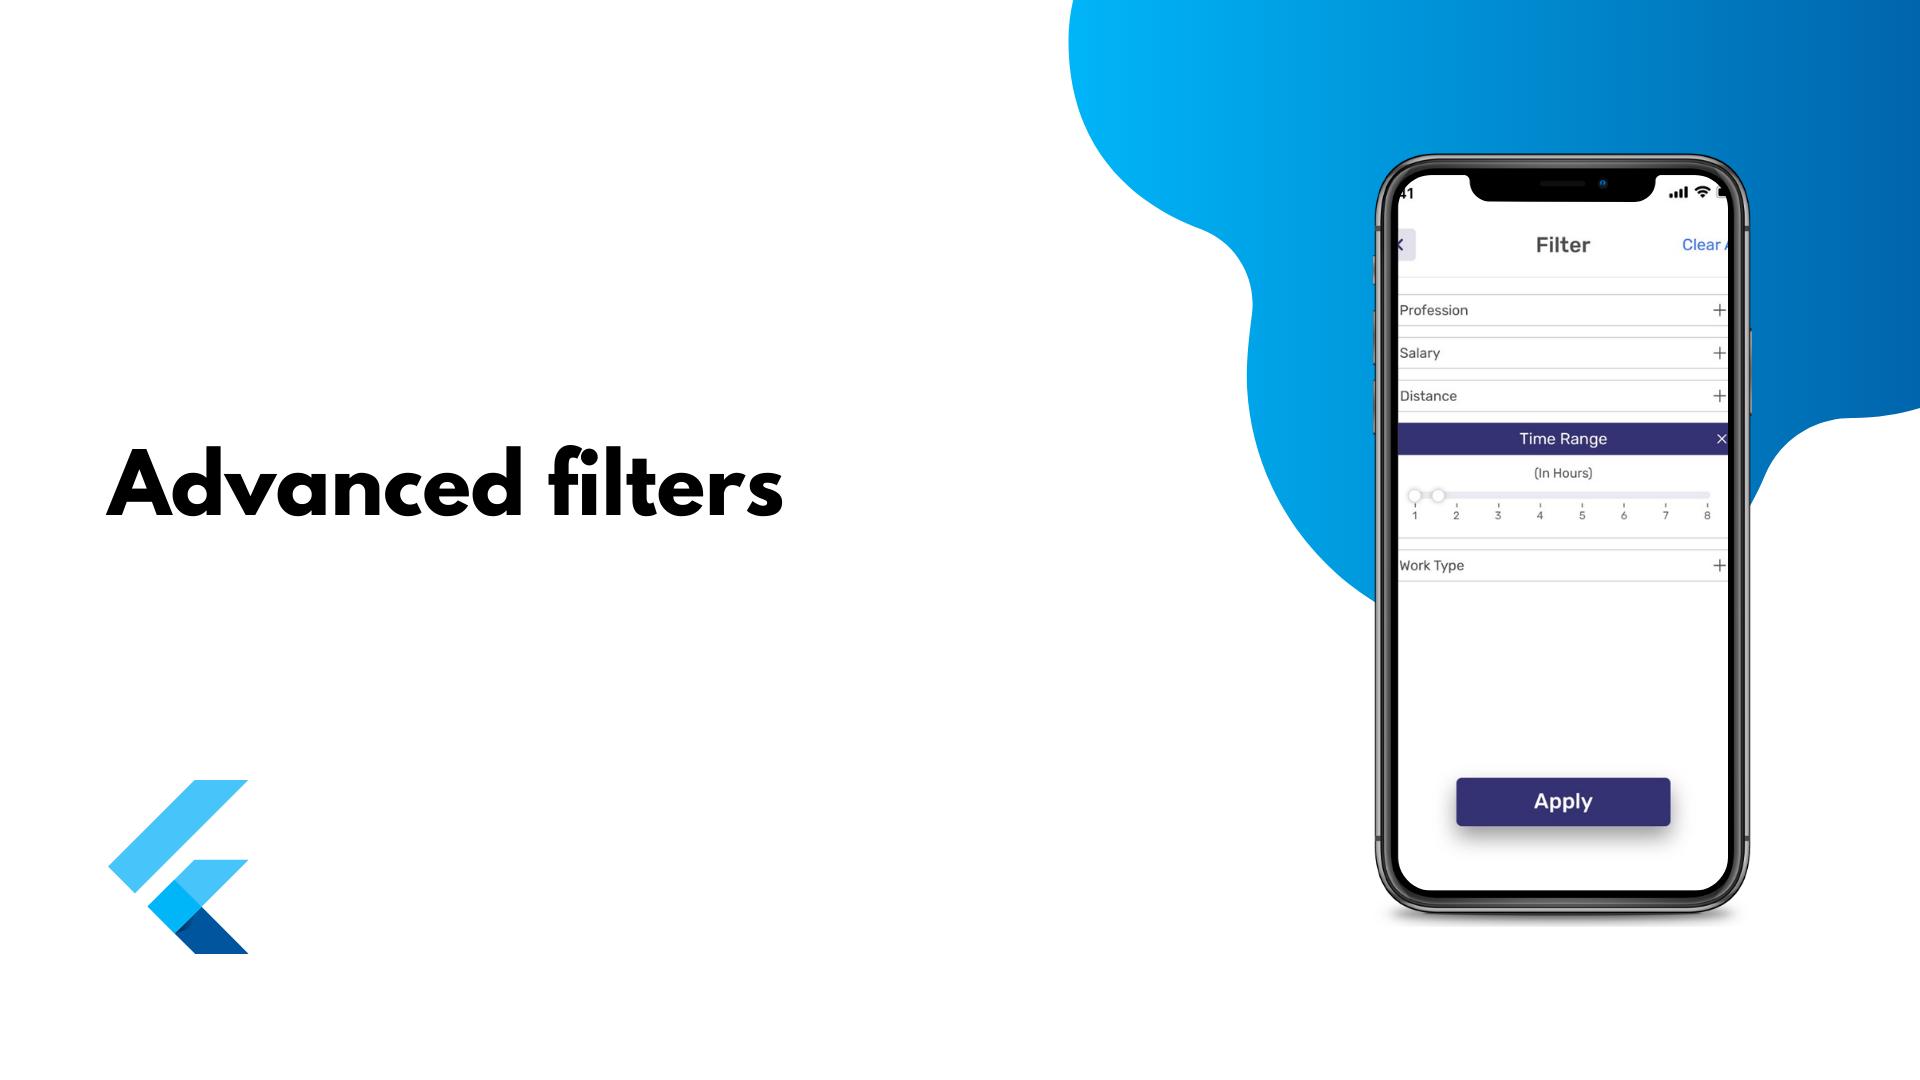 Job search professional networking social media UI KIT app in Flutter - 7